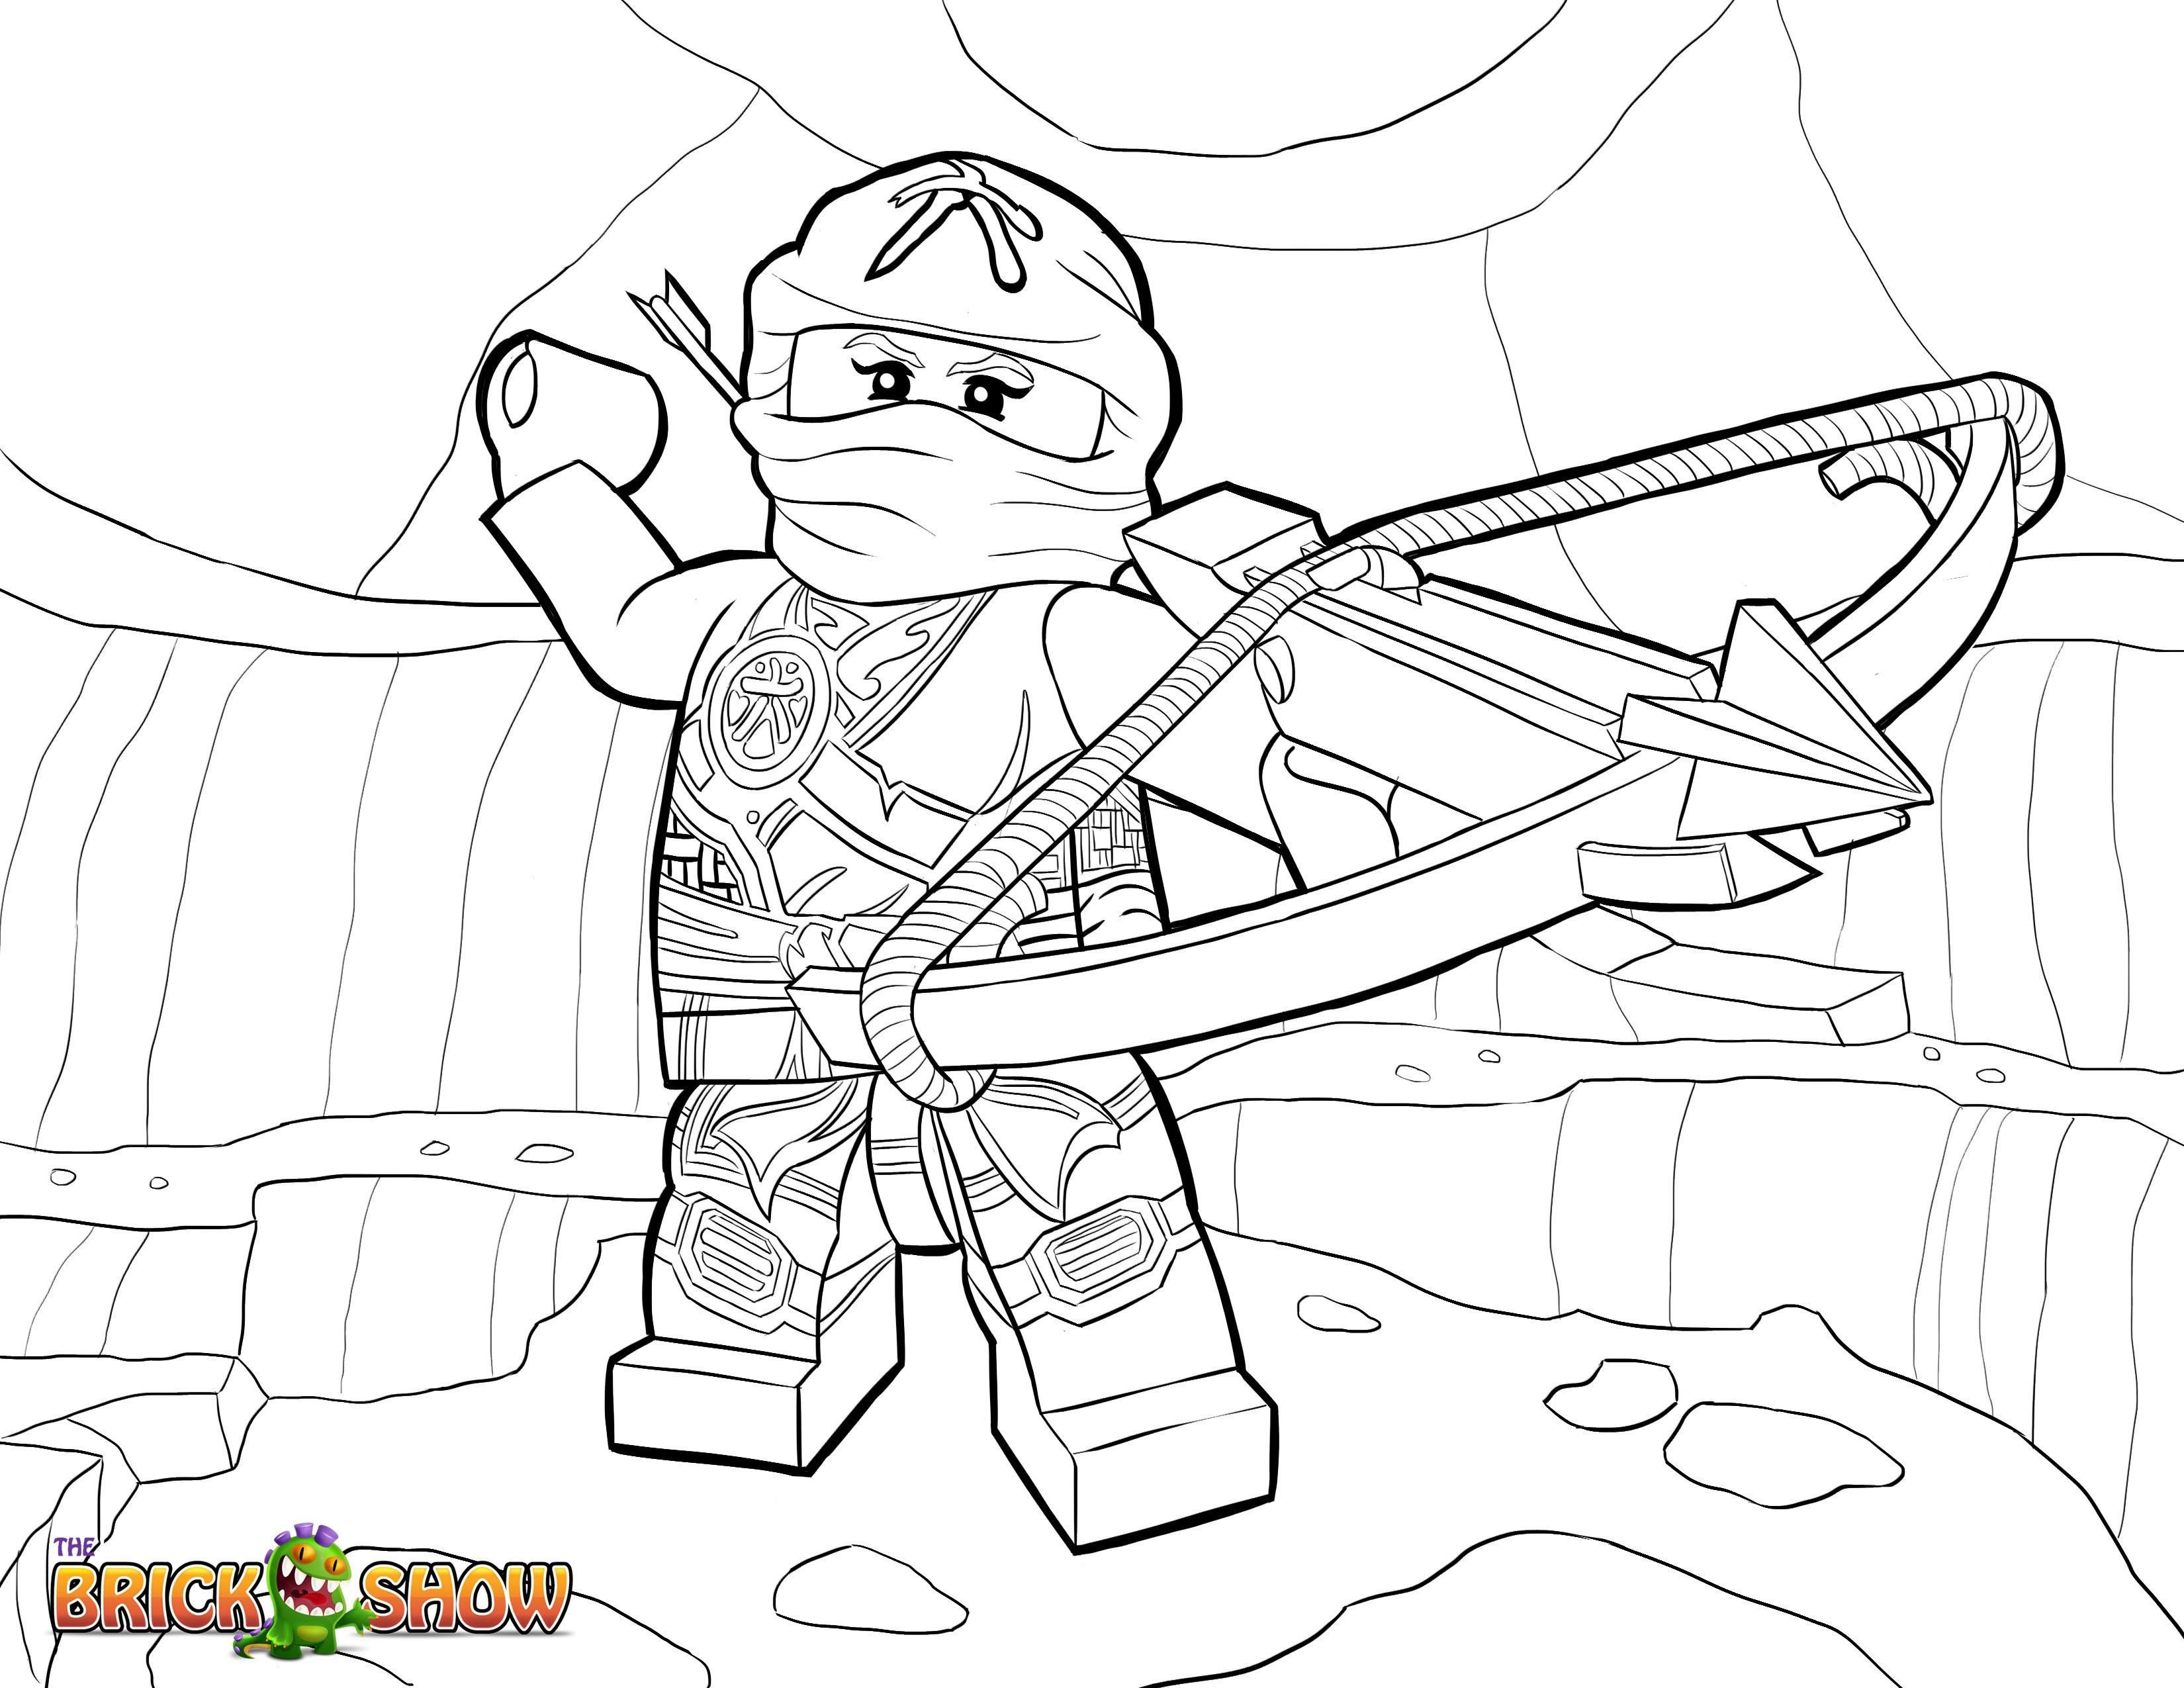 Lego Ninjago Malvorlagen Inspirierend 48 Motiv Lego Ninjago Ausmalbilder Cole Treehouse Nyc Bild